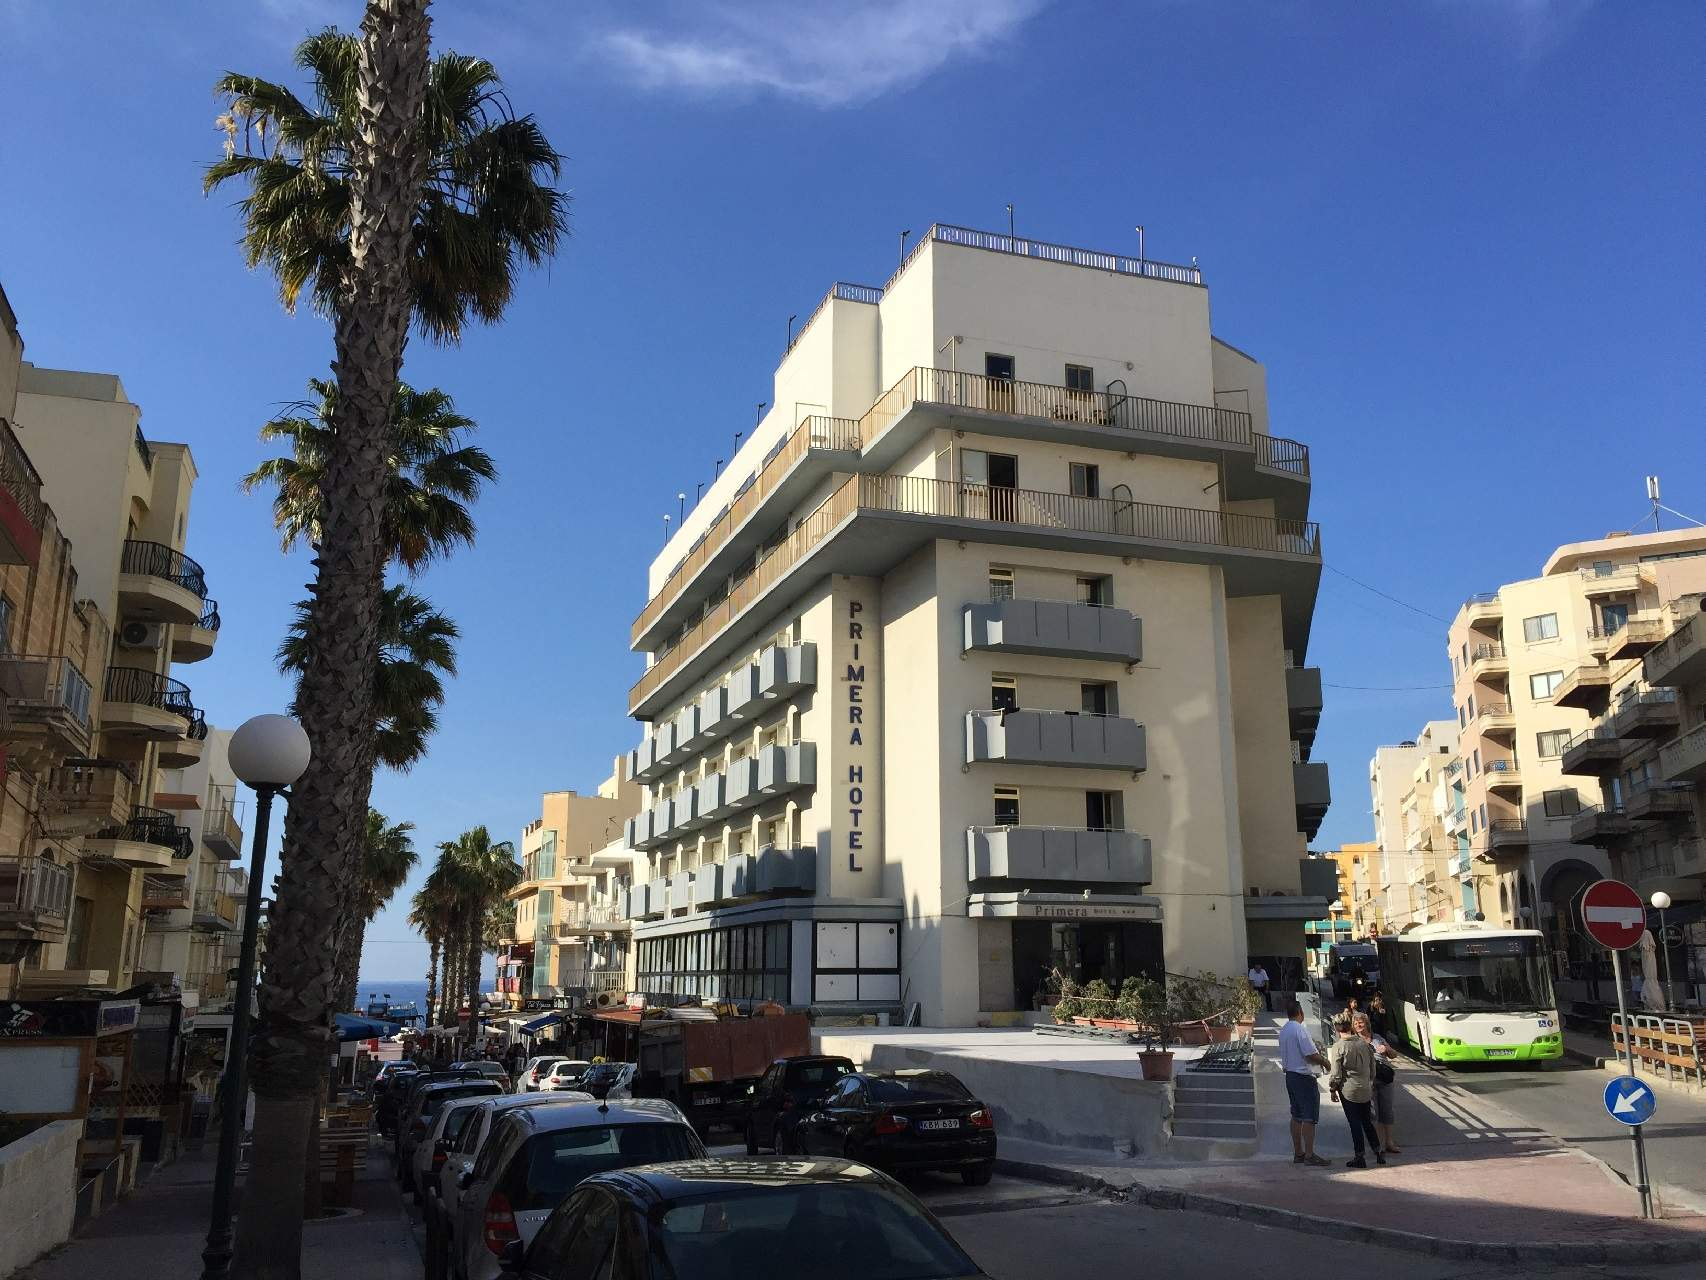 http://cdn.budavartours.hu/binaries/content/gallery/budavar/locations/accomodations/malta/bugibba/primera-hotel/primera-hotel-malta-bugibba11.jpg